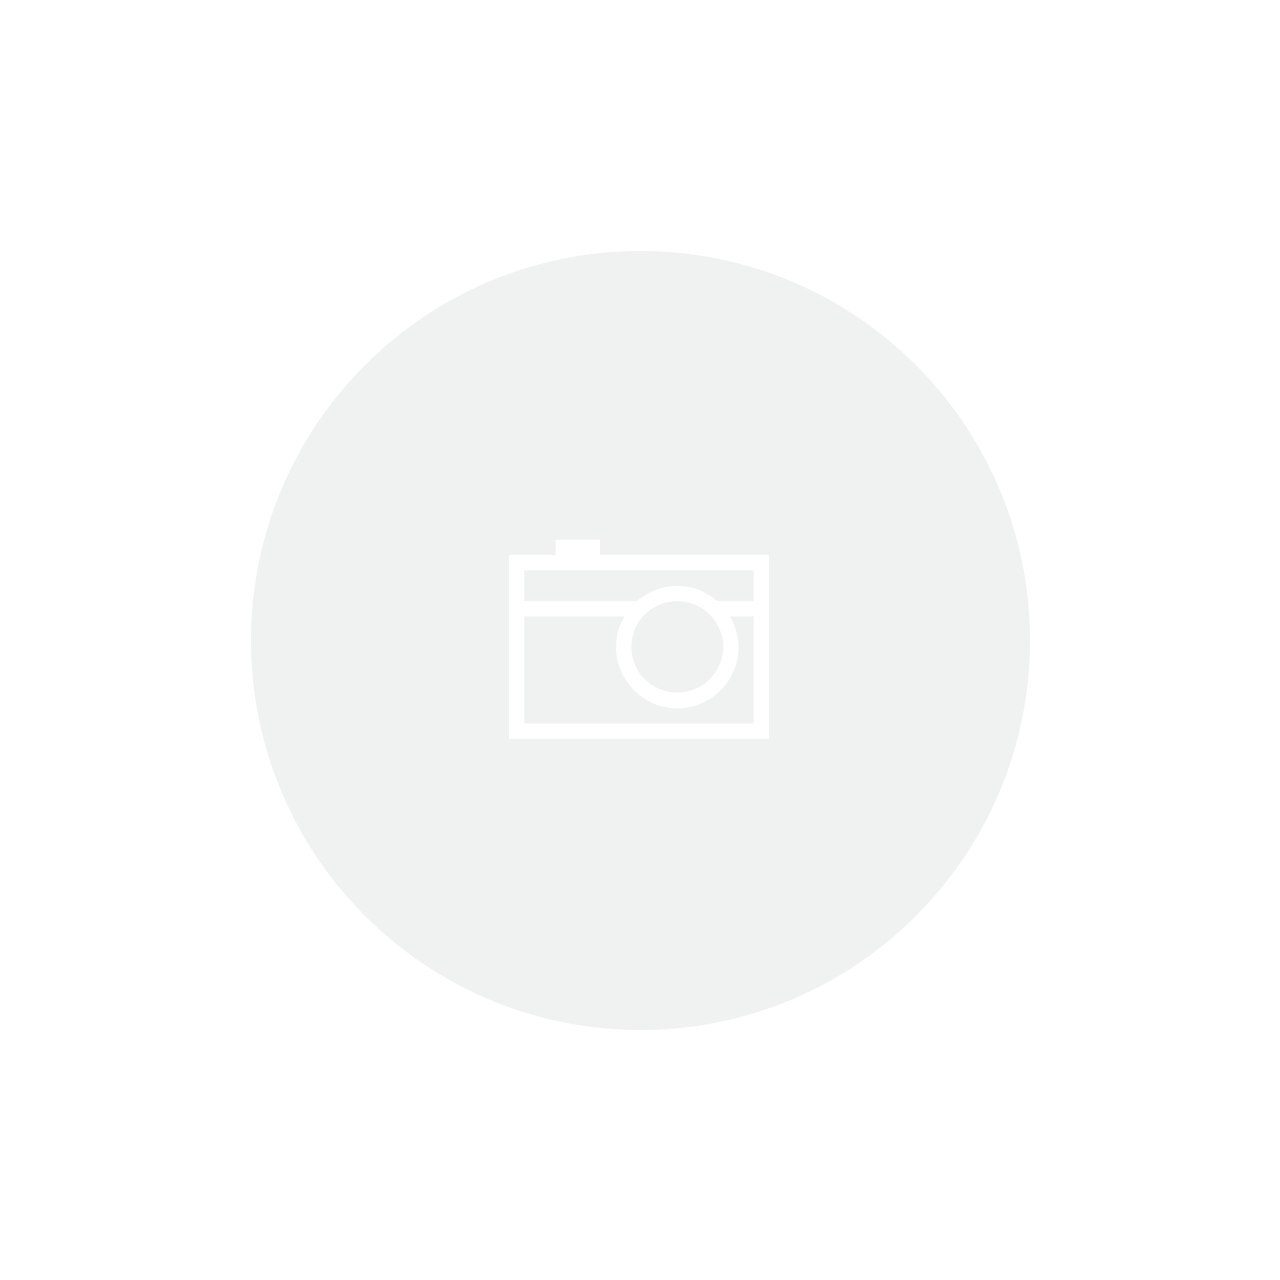 Fluido de Corte Solúvel 2x5 Litros